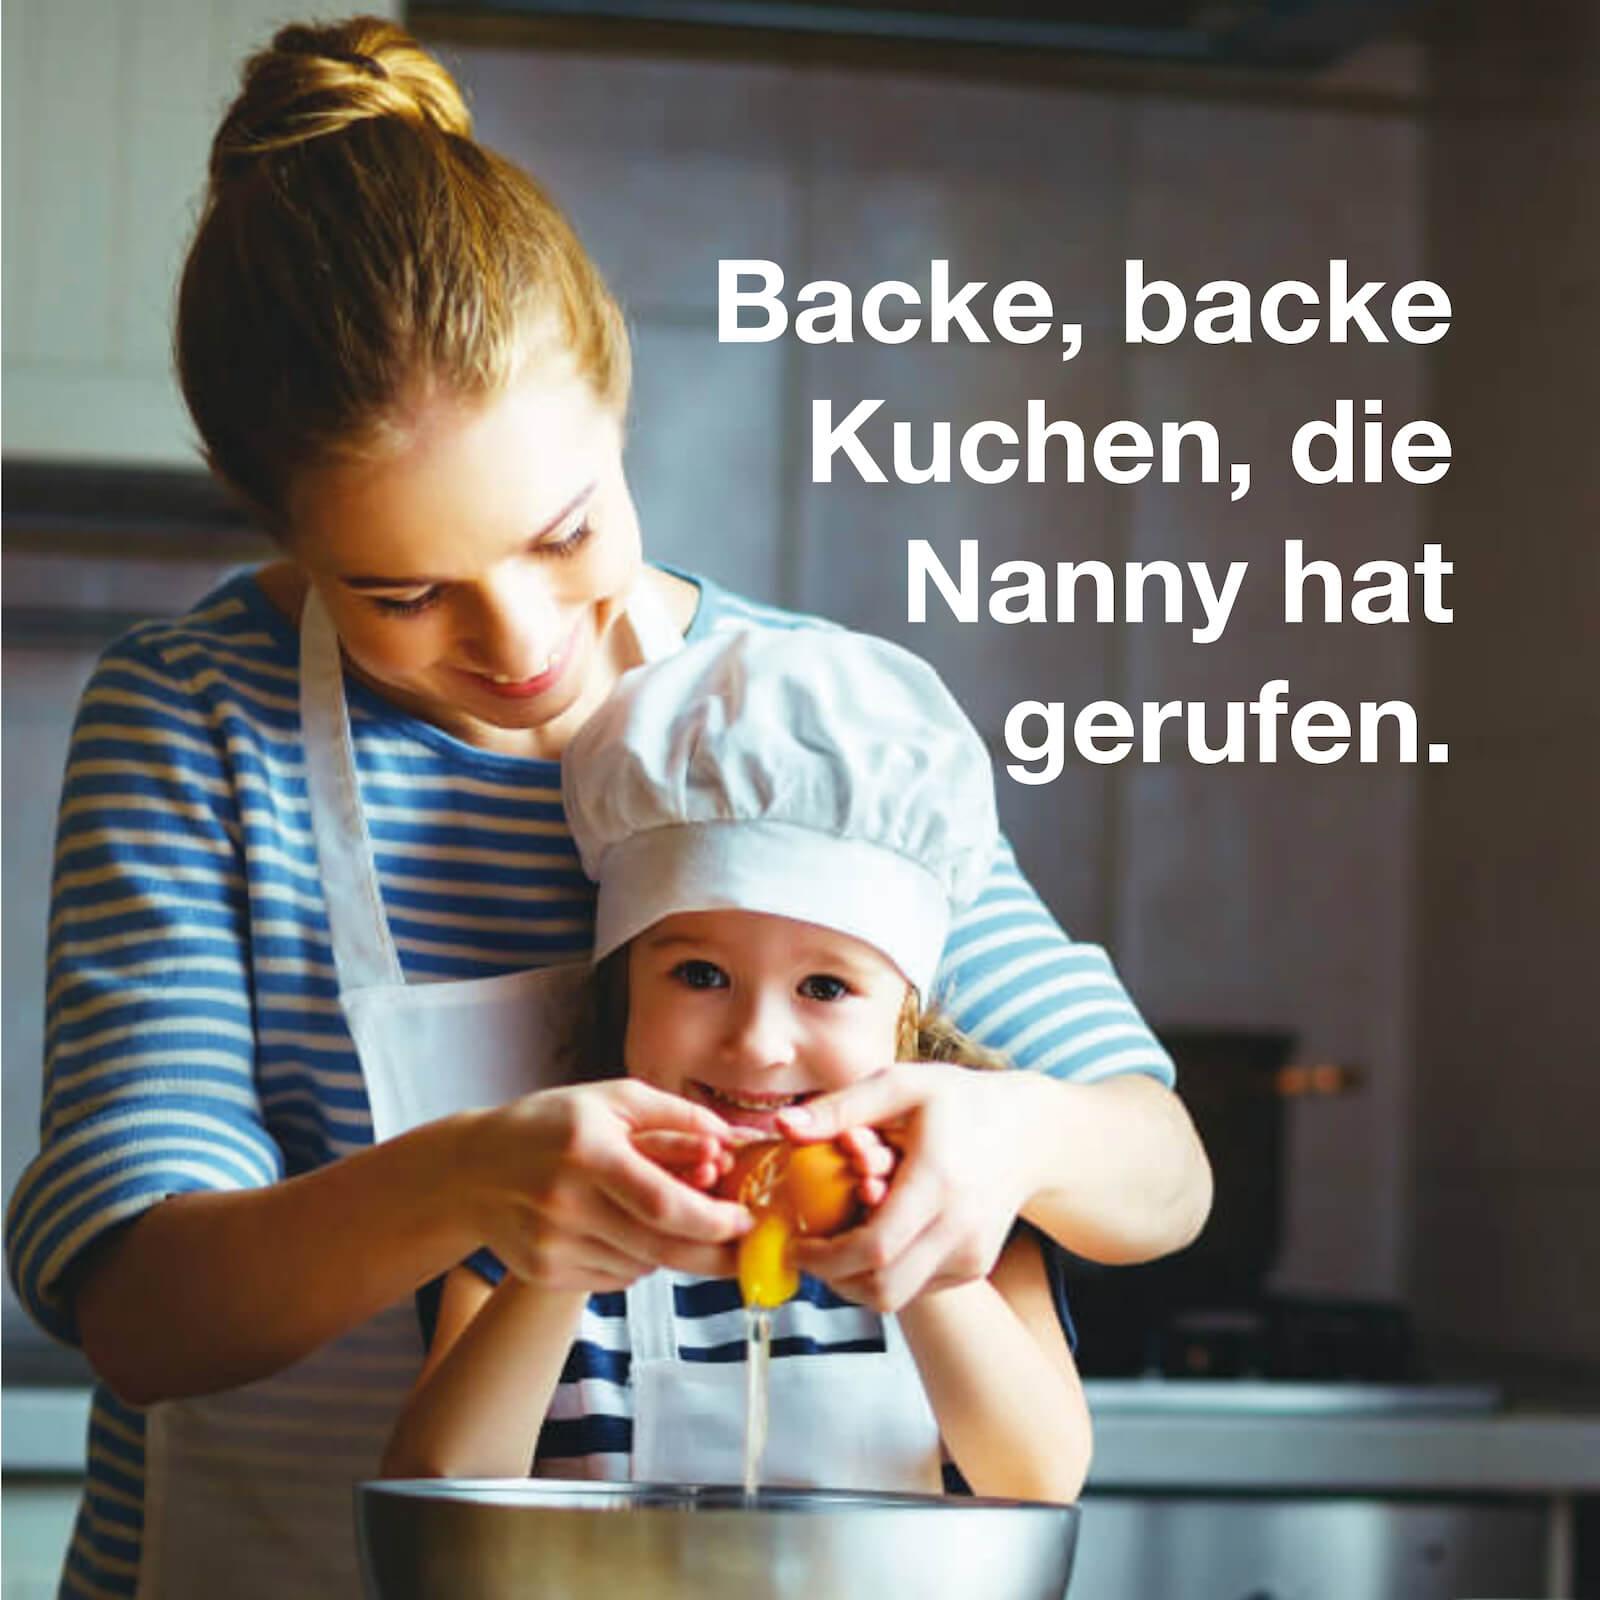 Backe, backe Kuchen, die Nanny hat gerufen.